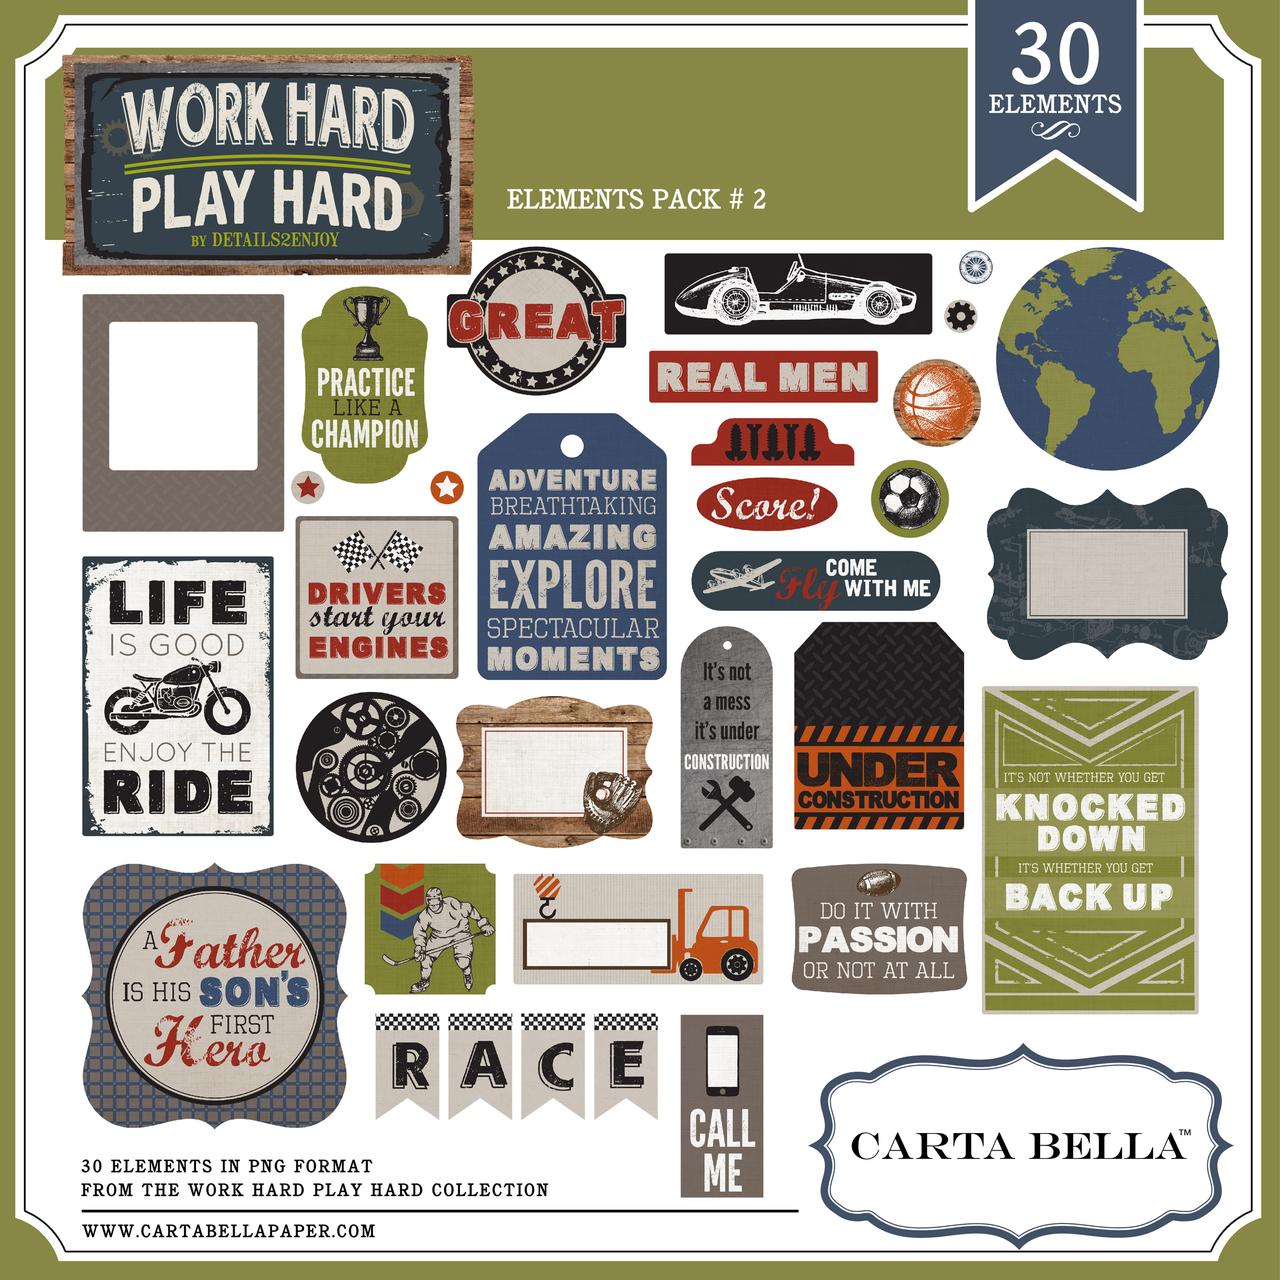 Work Hard Play Hard Element Pack 2